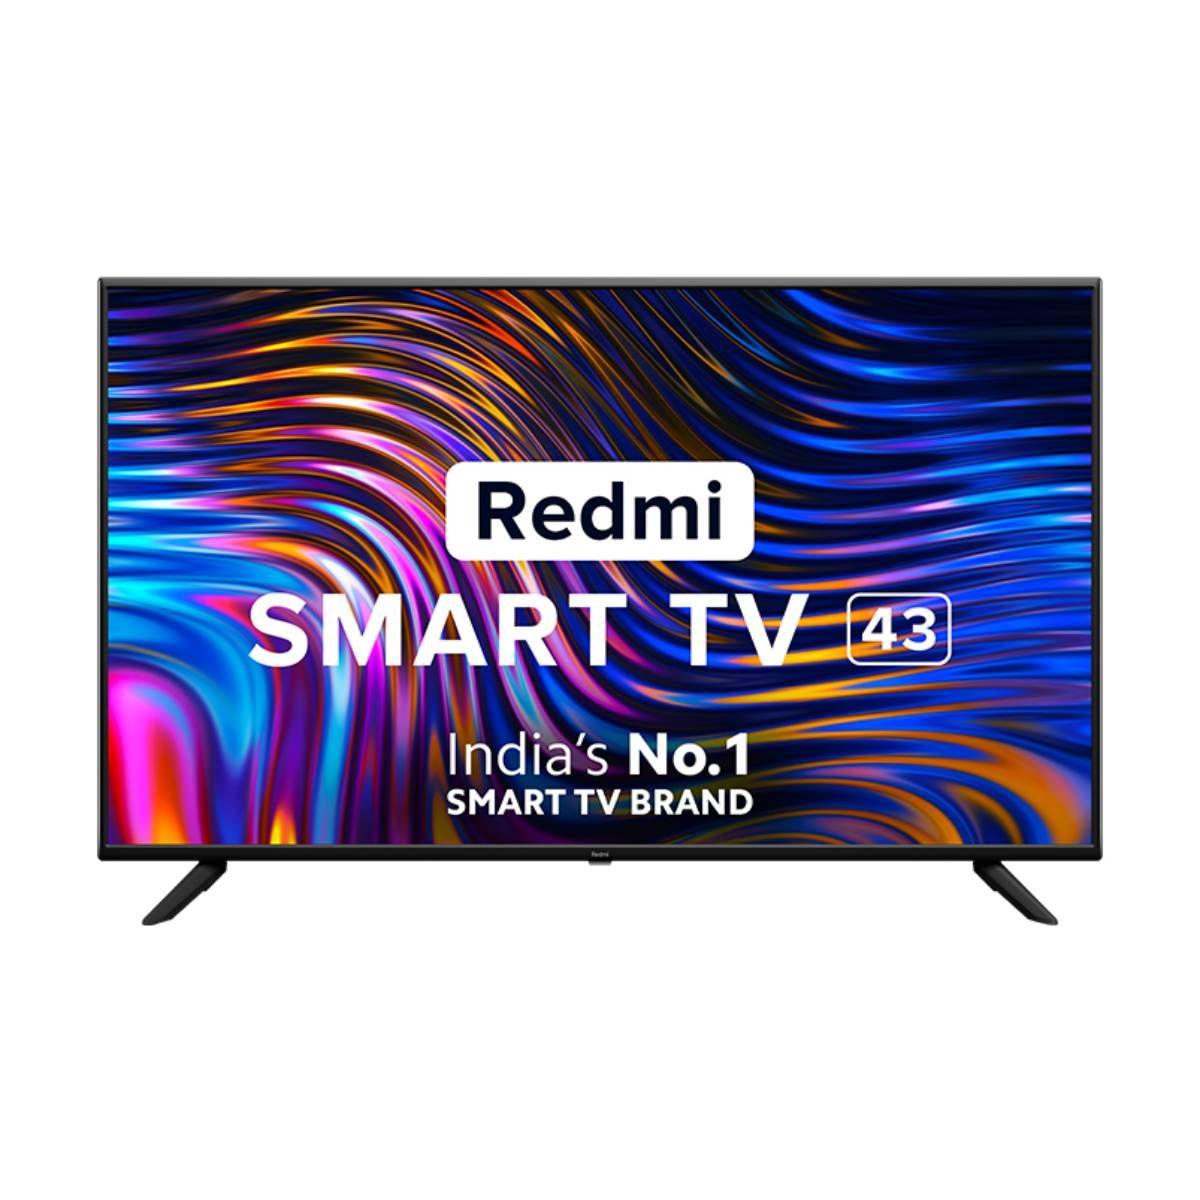 Redmi Smart TV 43-inch HD Ready TV